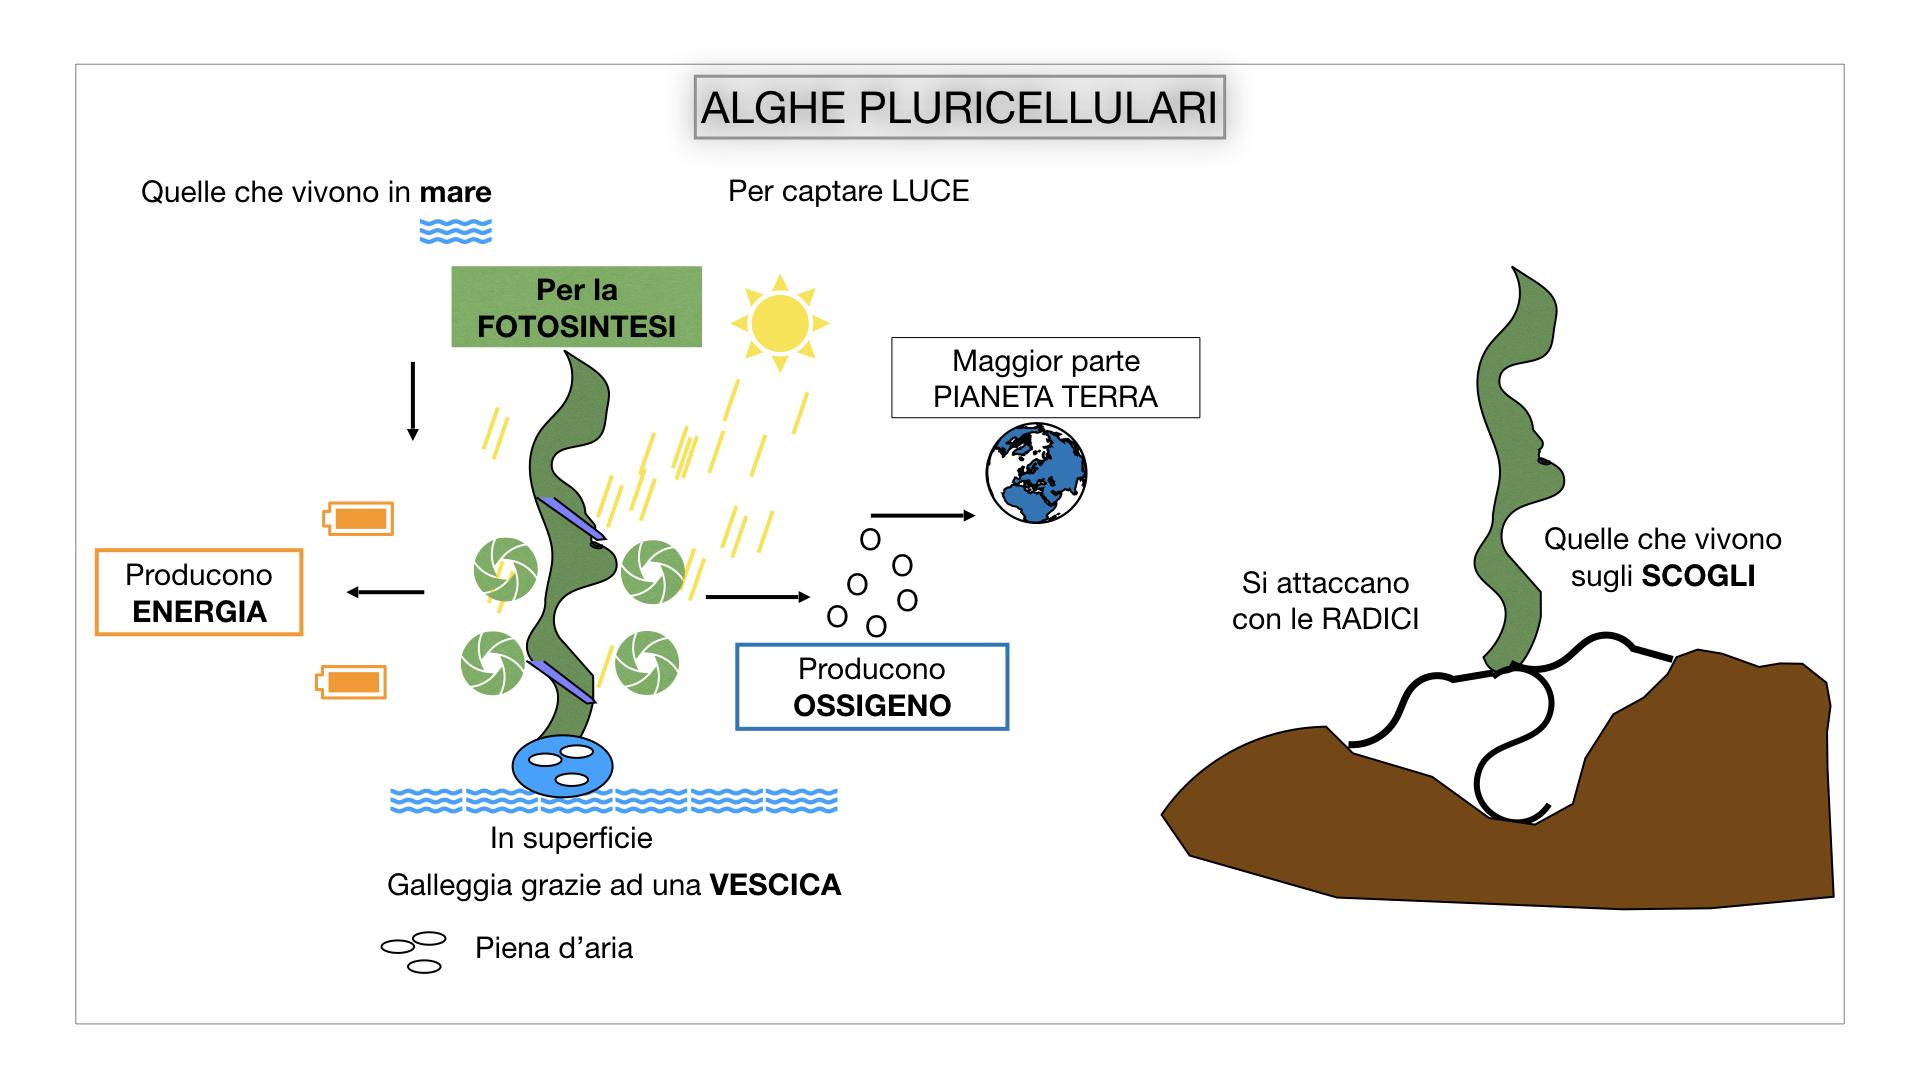 8. alghe uni_pluri_cellulari_SIMULAZIONE.041